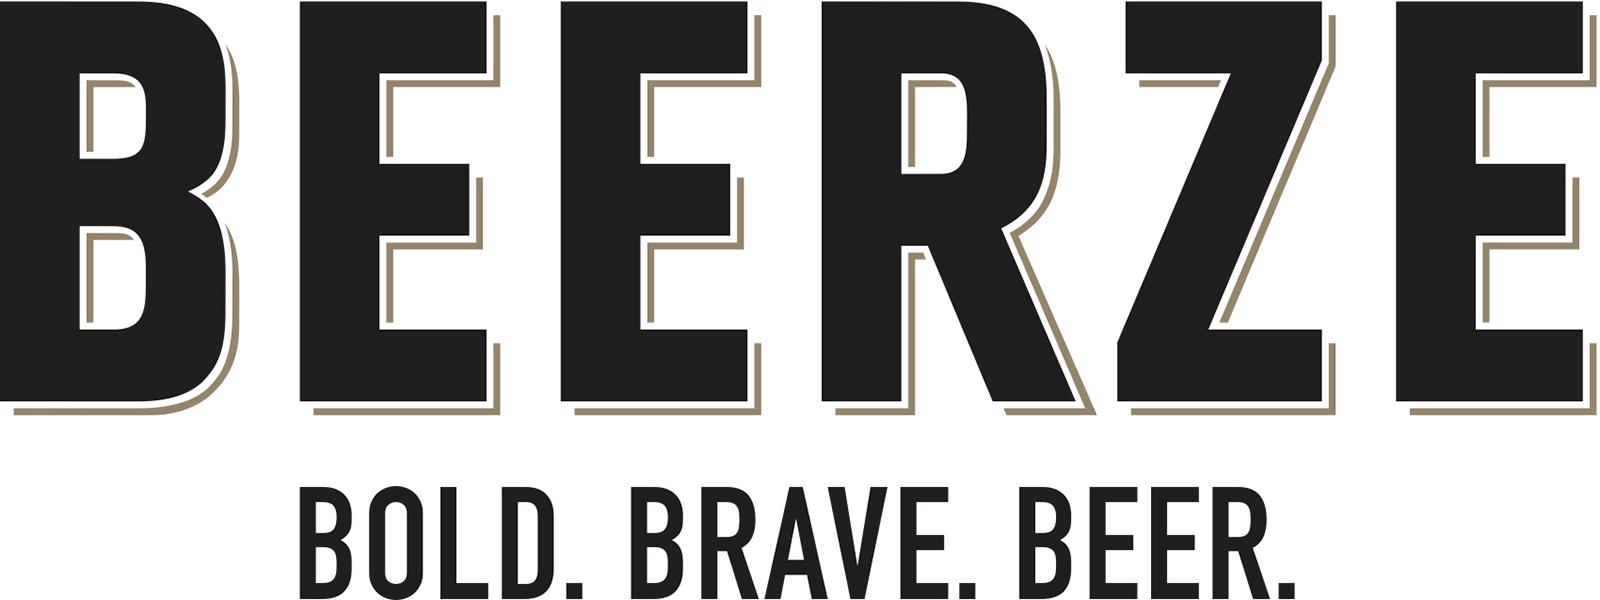 Beerze Bold Brave Beer FSOM Magazine TheDutchBeerDad